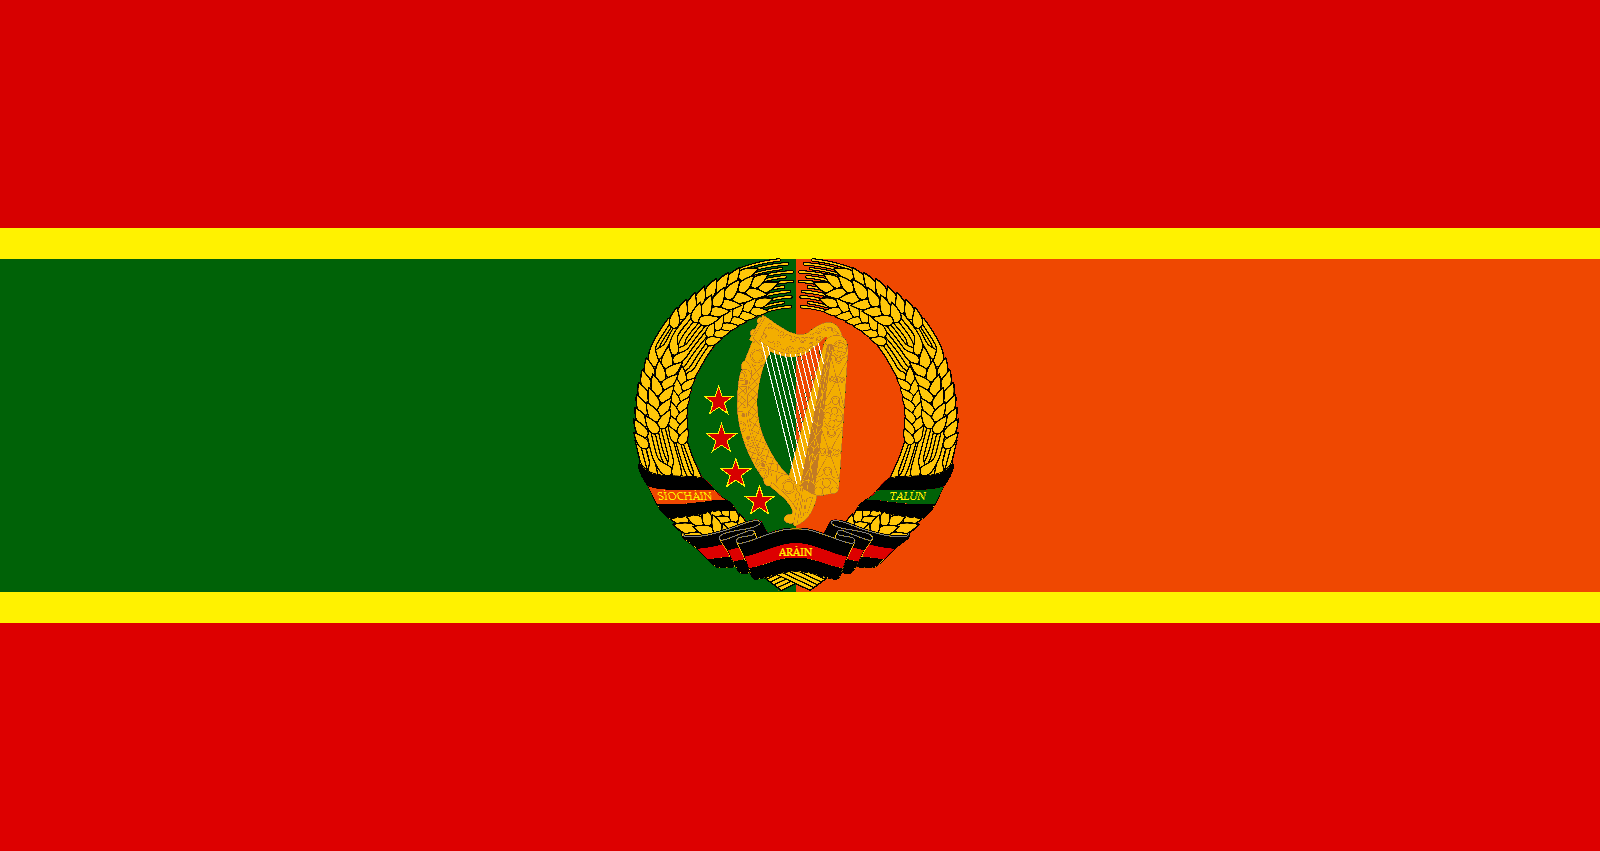 irish communist party fallout fanfiction wiki fandom powered